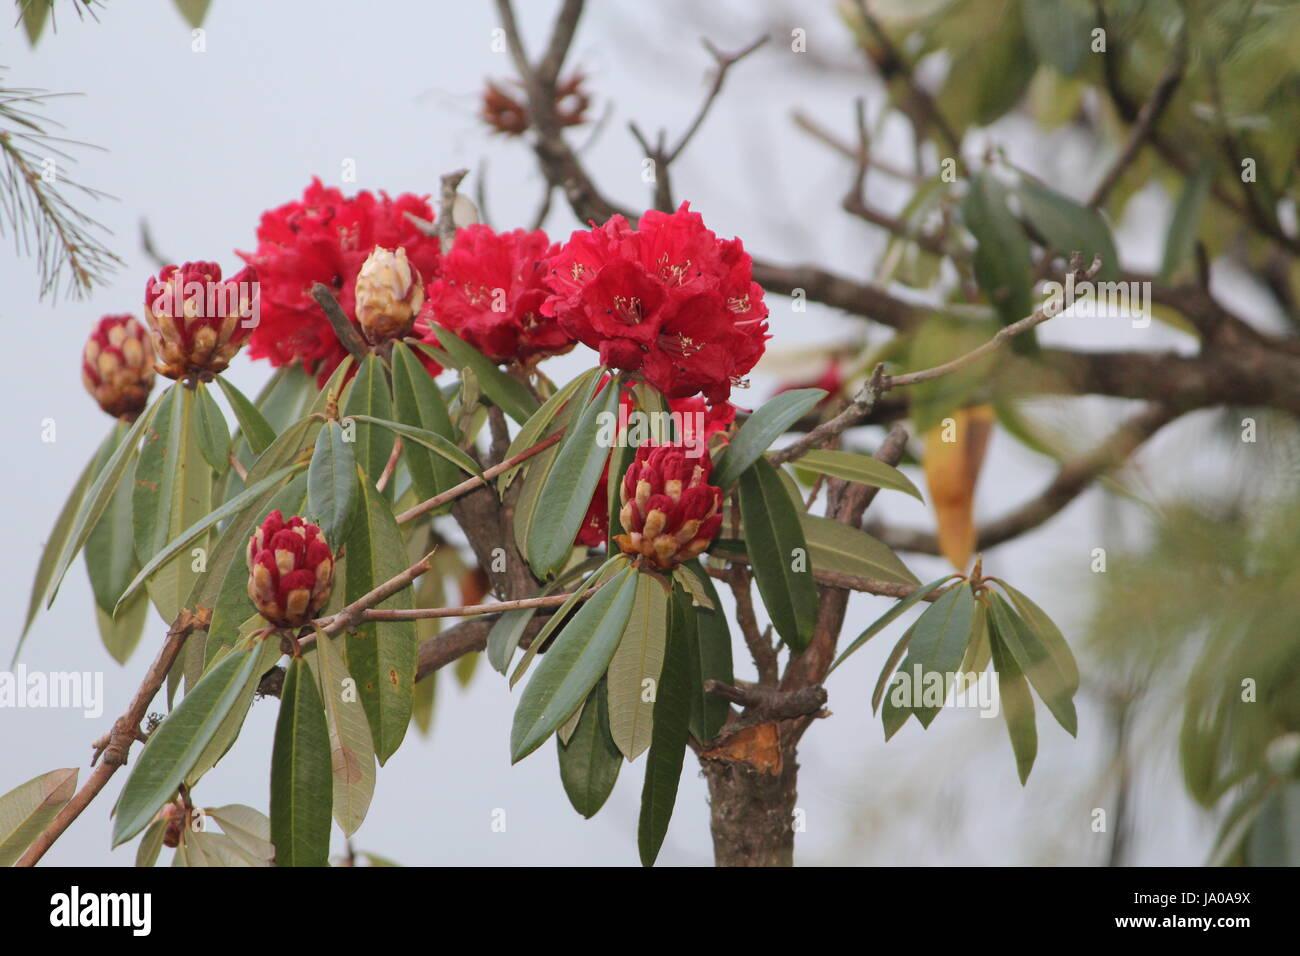 rhododendron arboreum (burans) - Stock Image